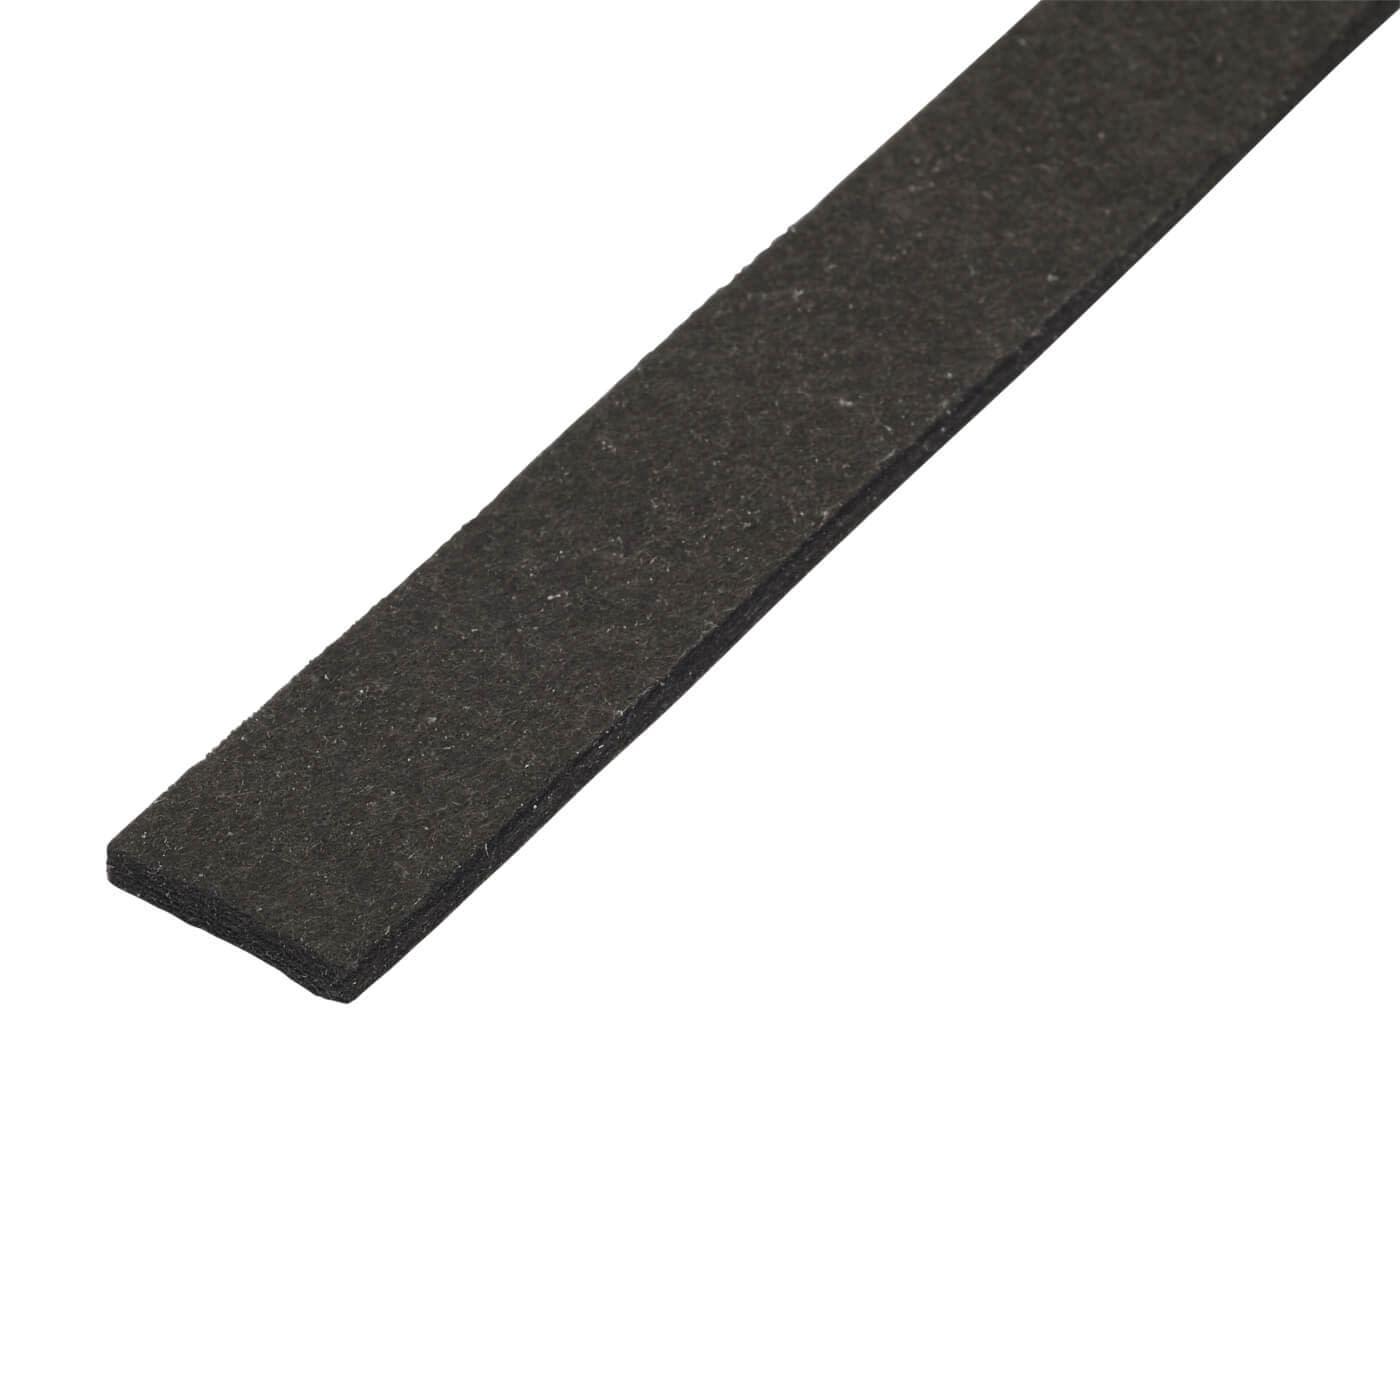 Sealmaster Fire Rated Glazing Tape - 10 x 2mm x 10m - Black)